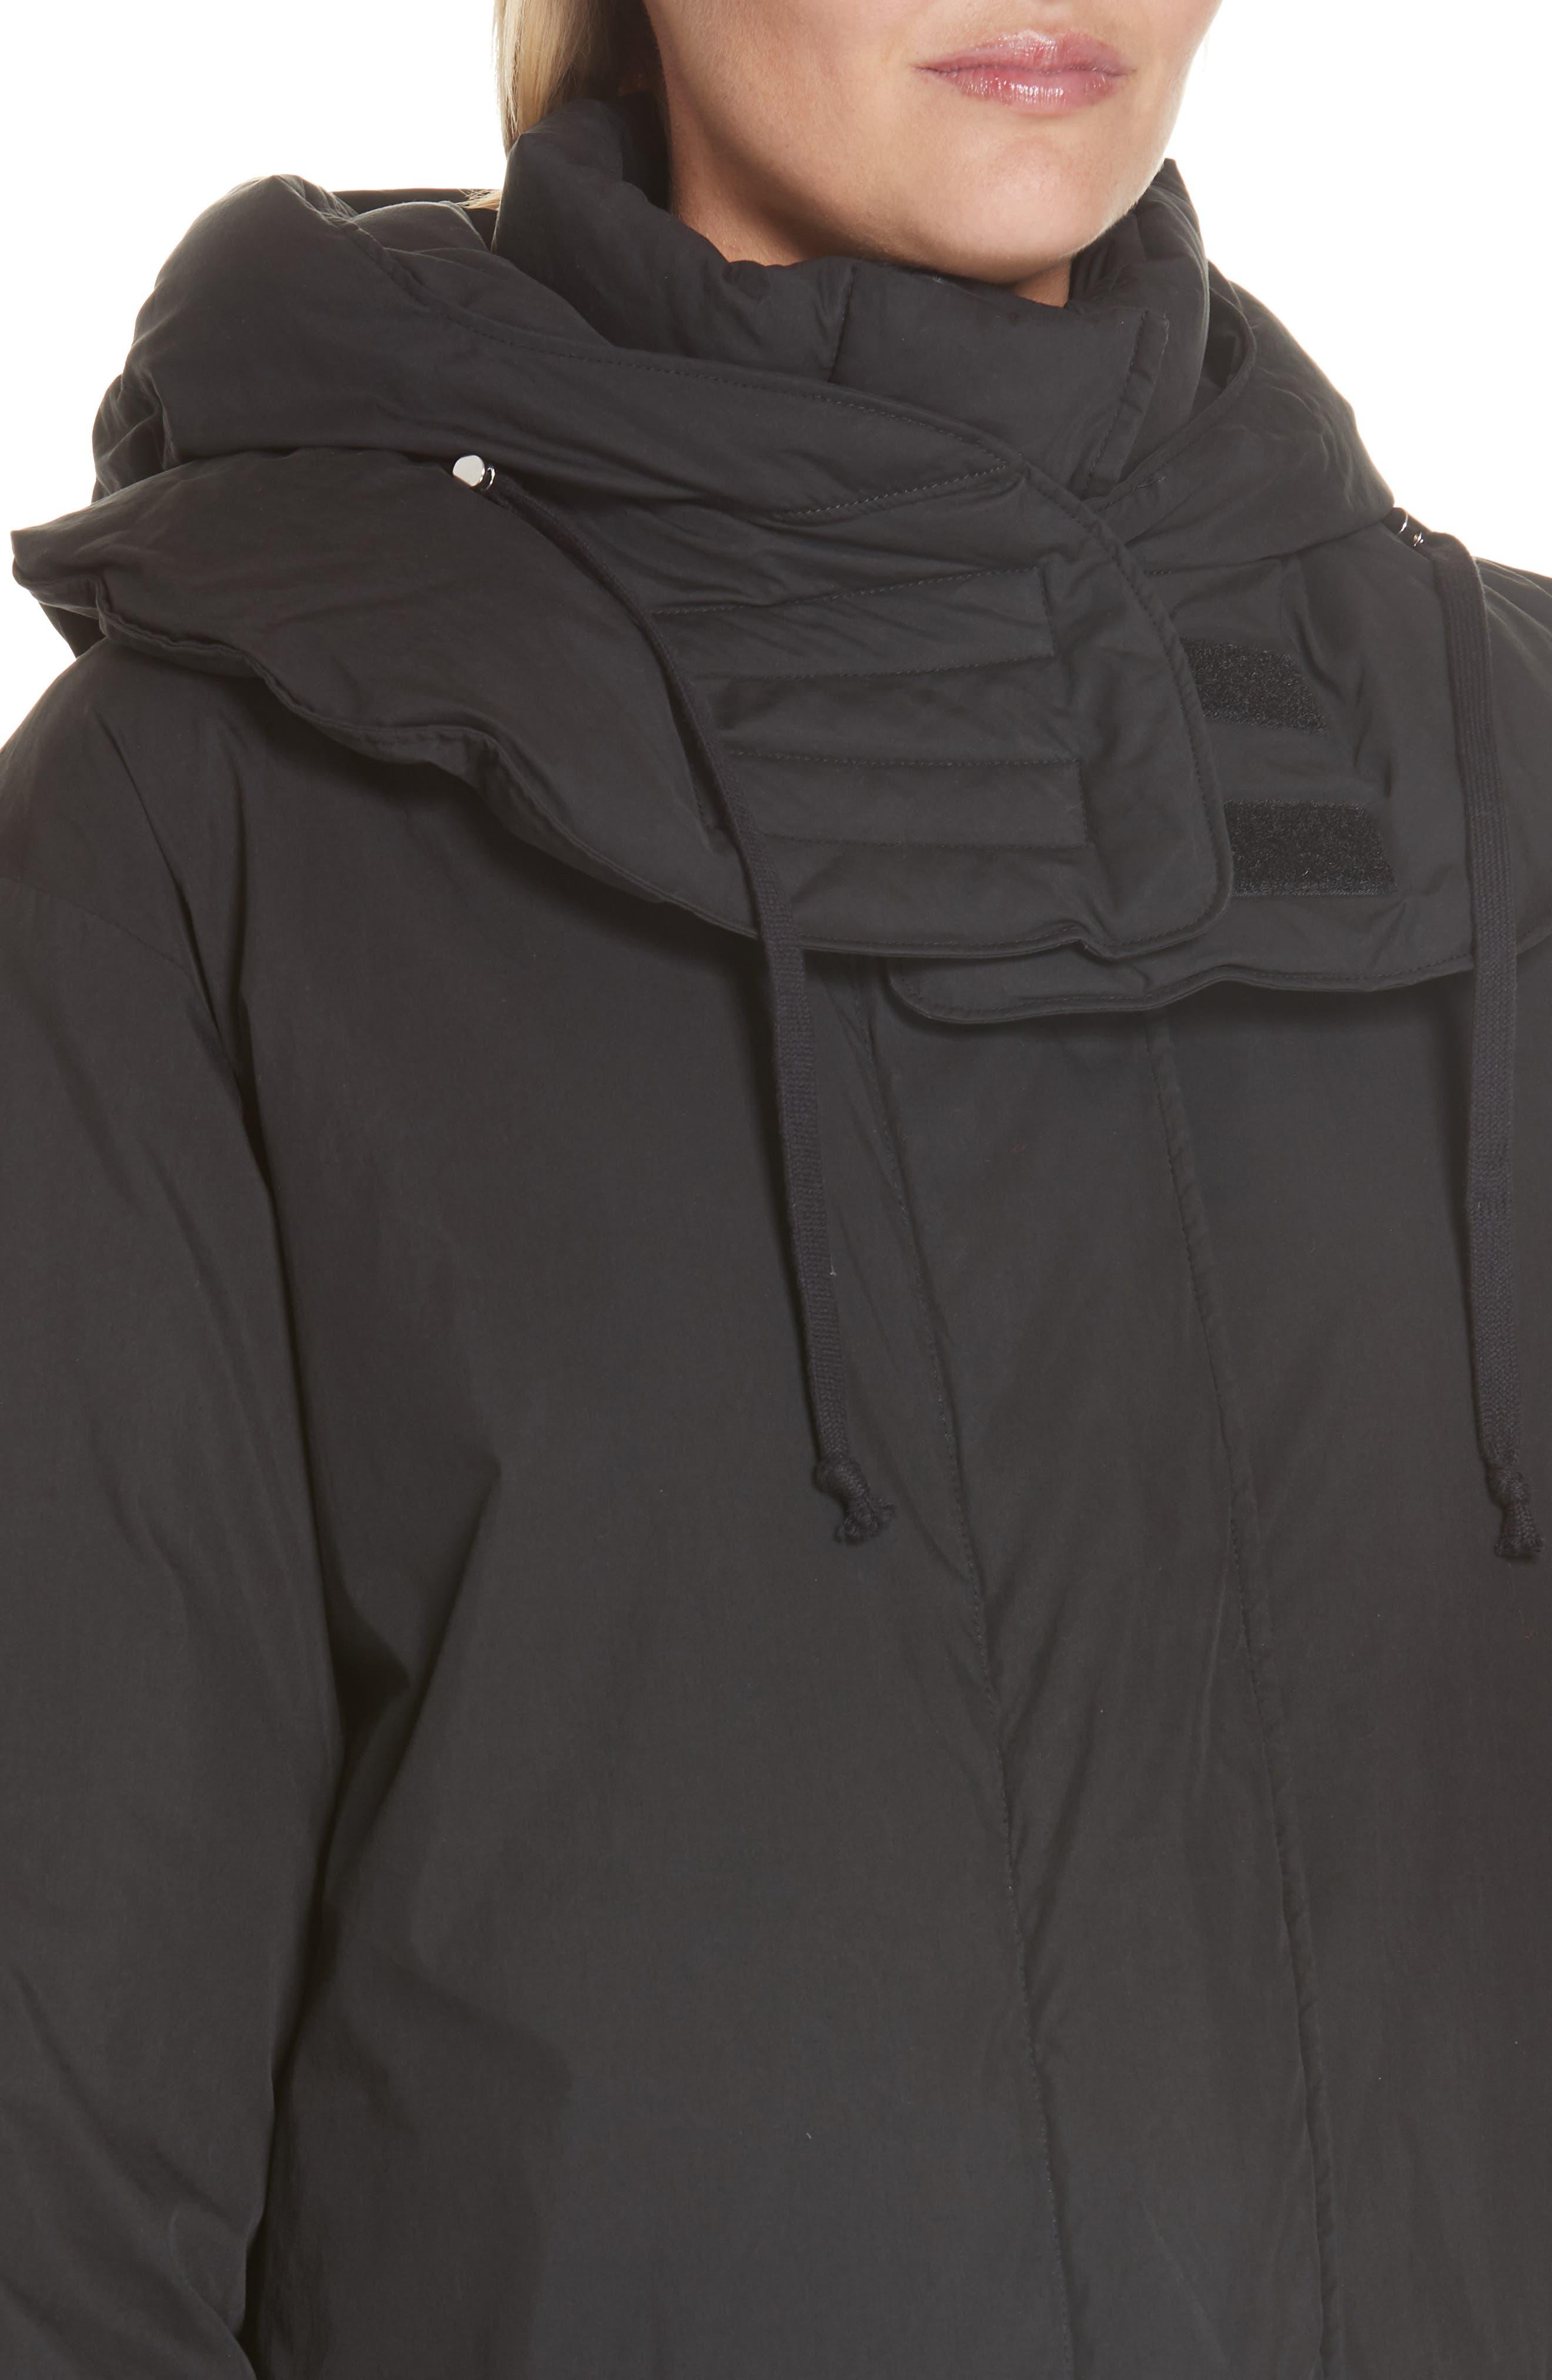 Removable Hood Puffer Jacket,                             Alternate thumbnail 6, color,                             BLACK